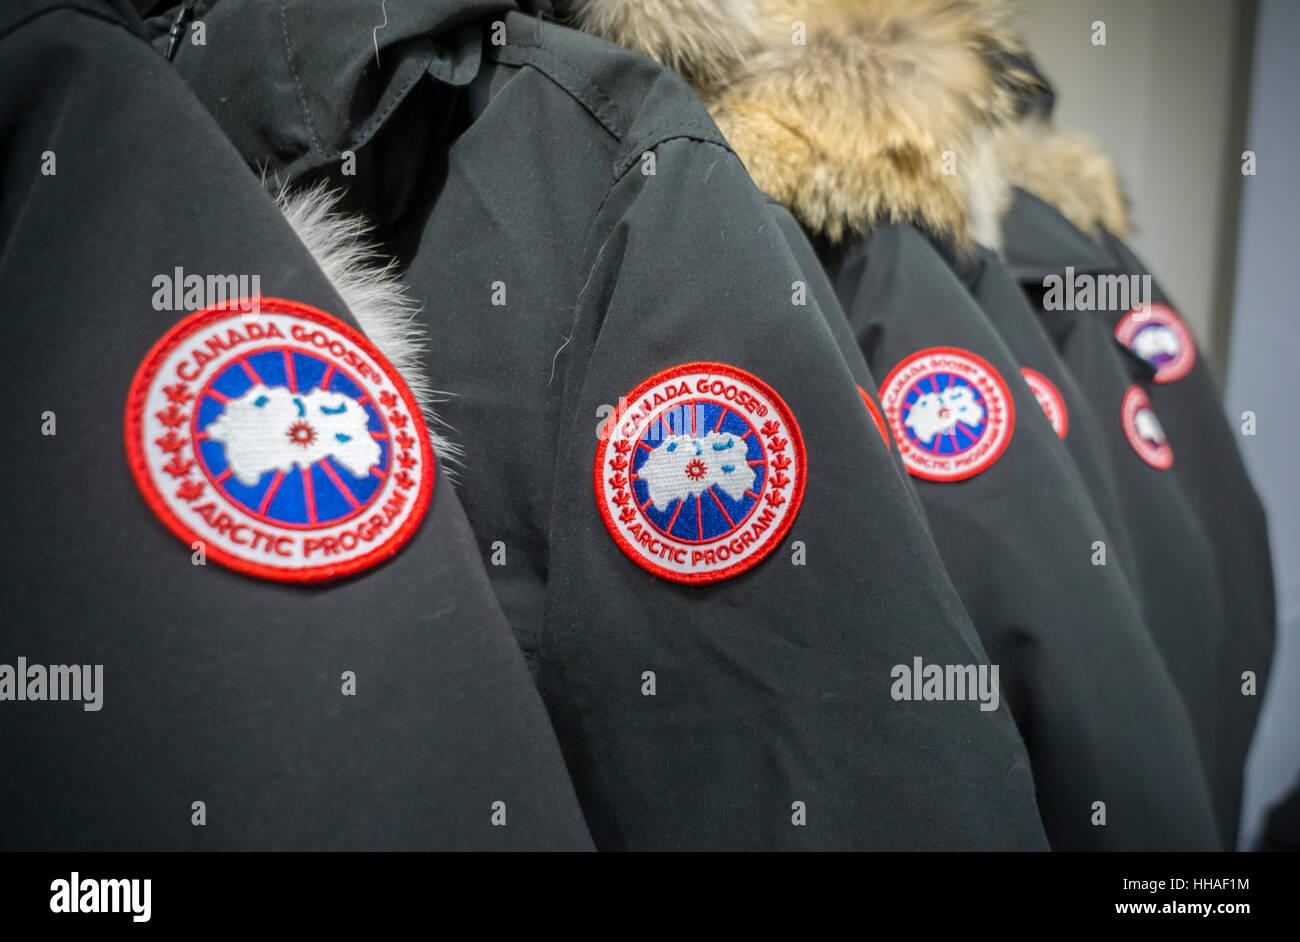 canada goose brand image